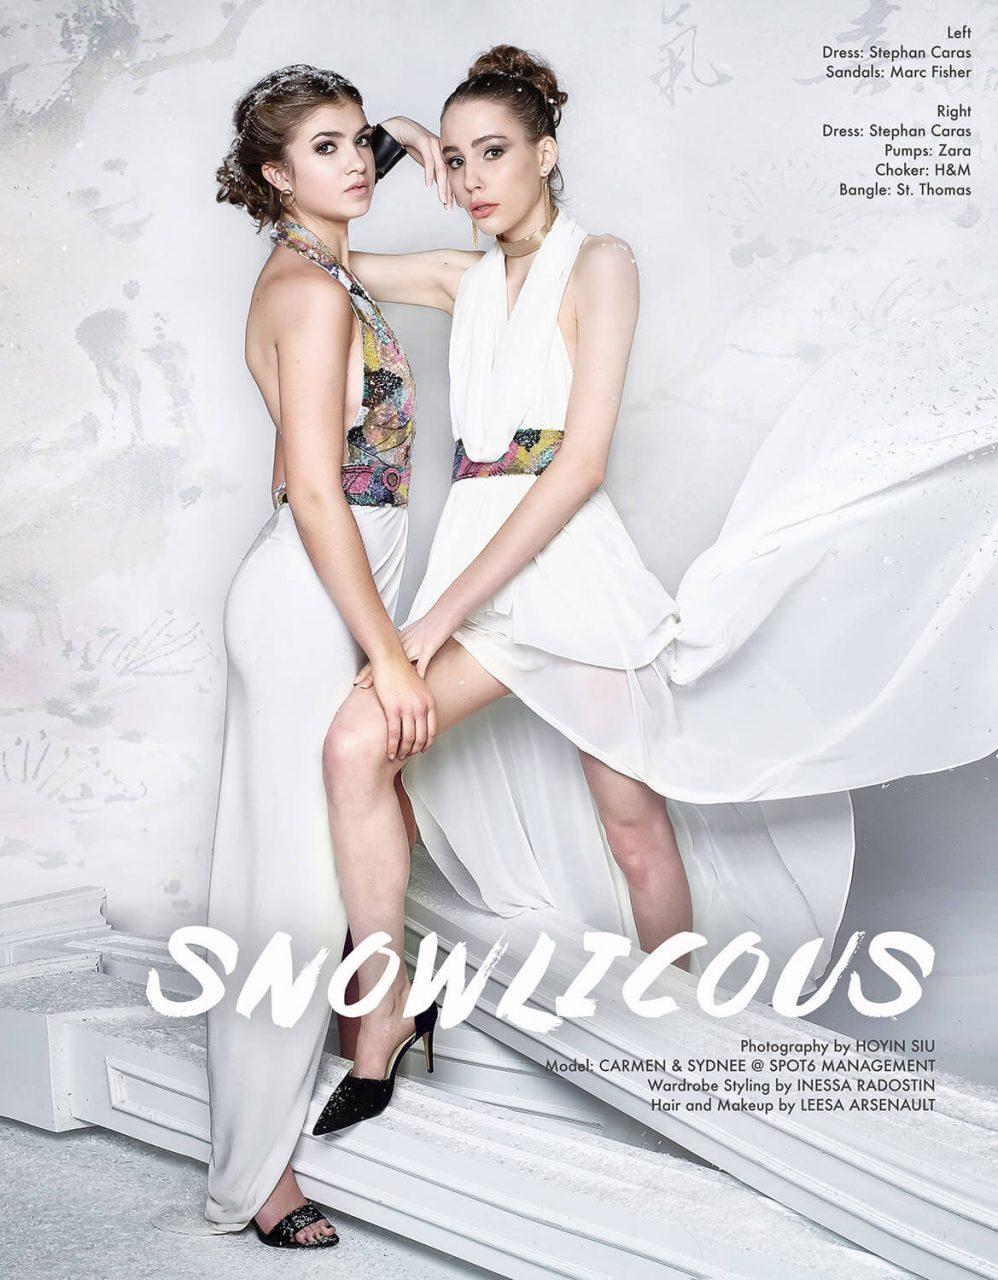 Snowlicous